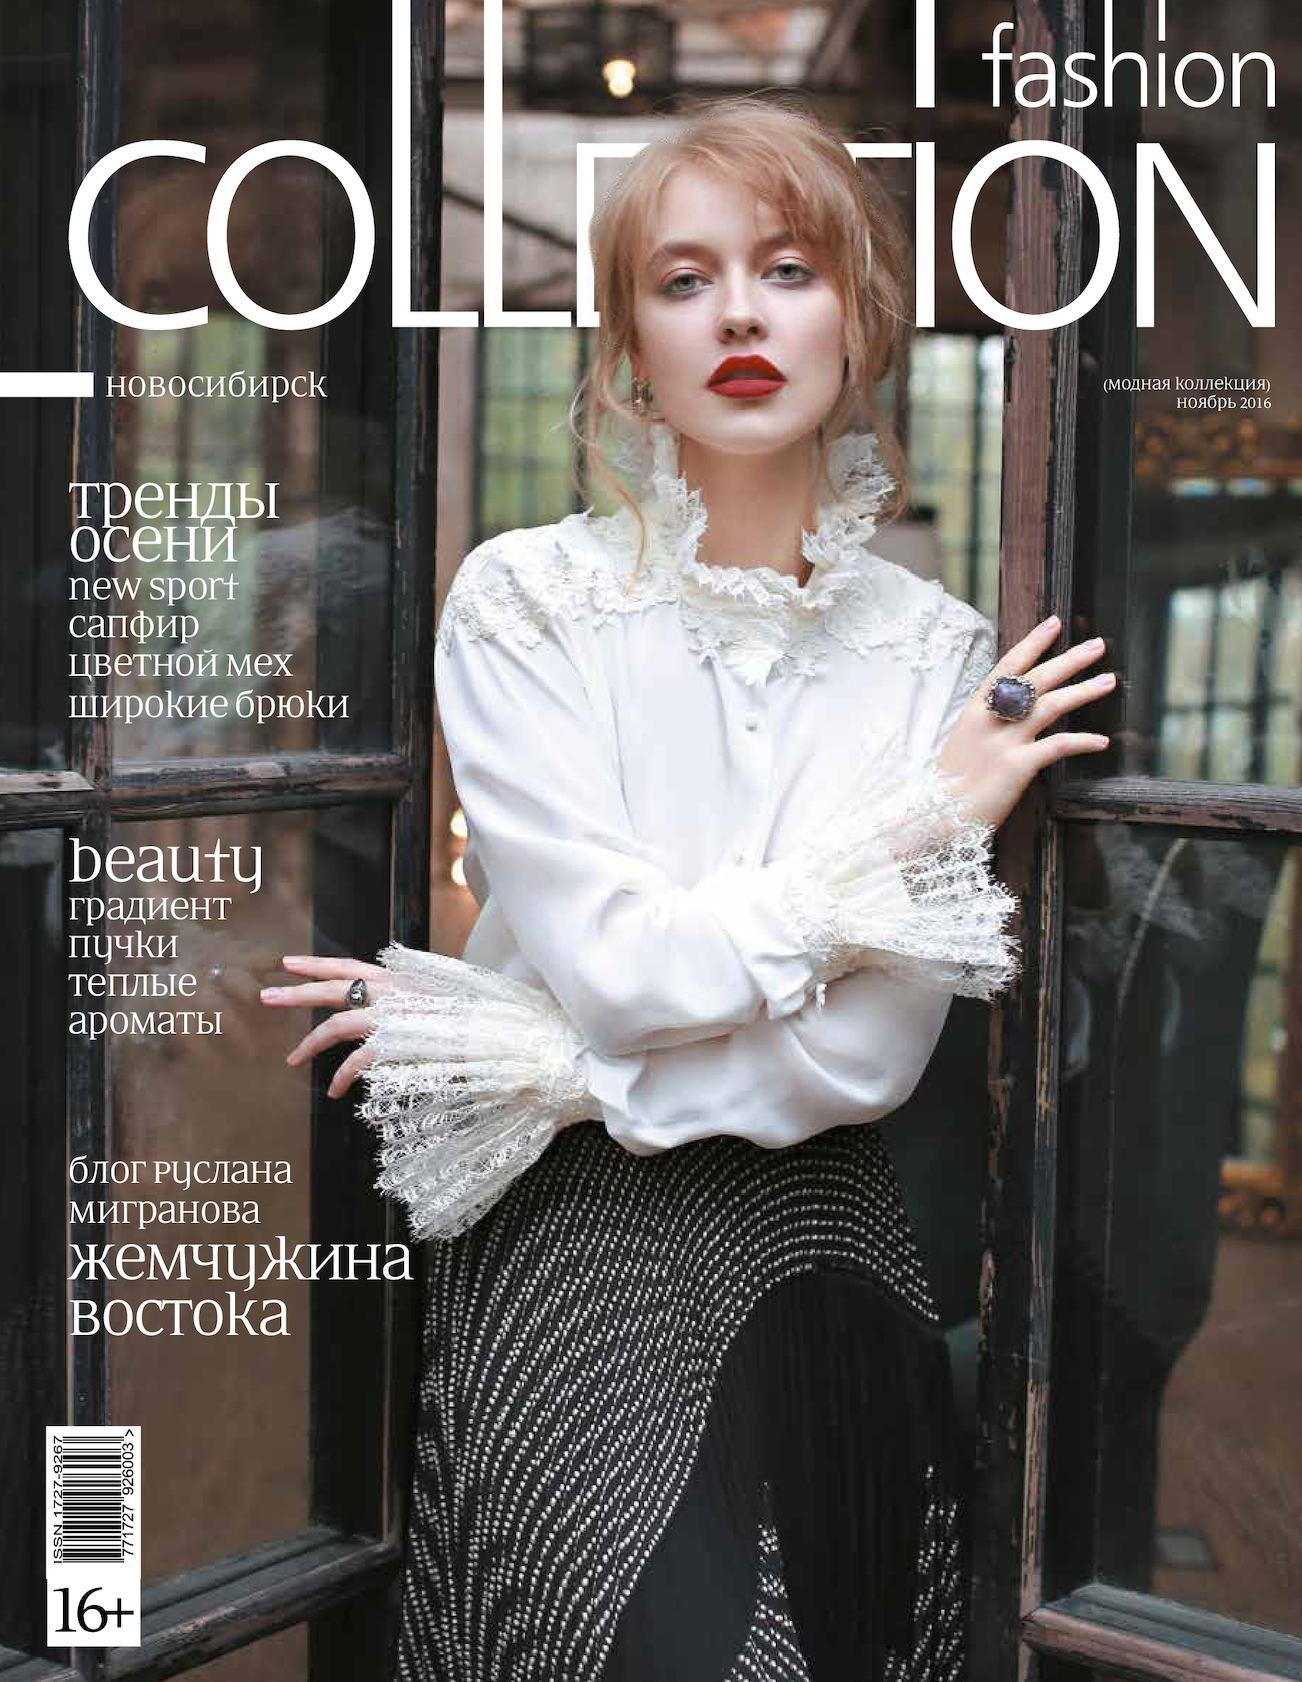 Calaméo - Fashion Collection Новосибирск ffac4d28a96d5